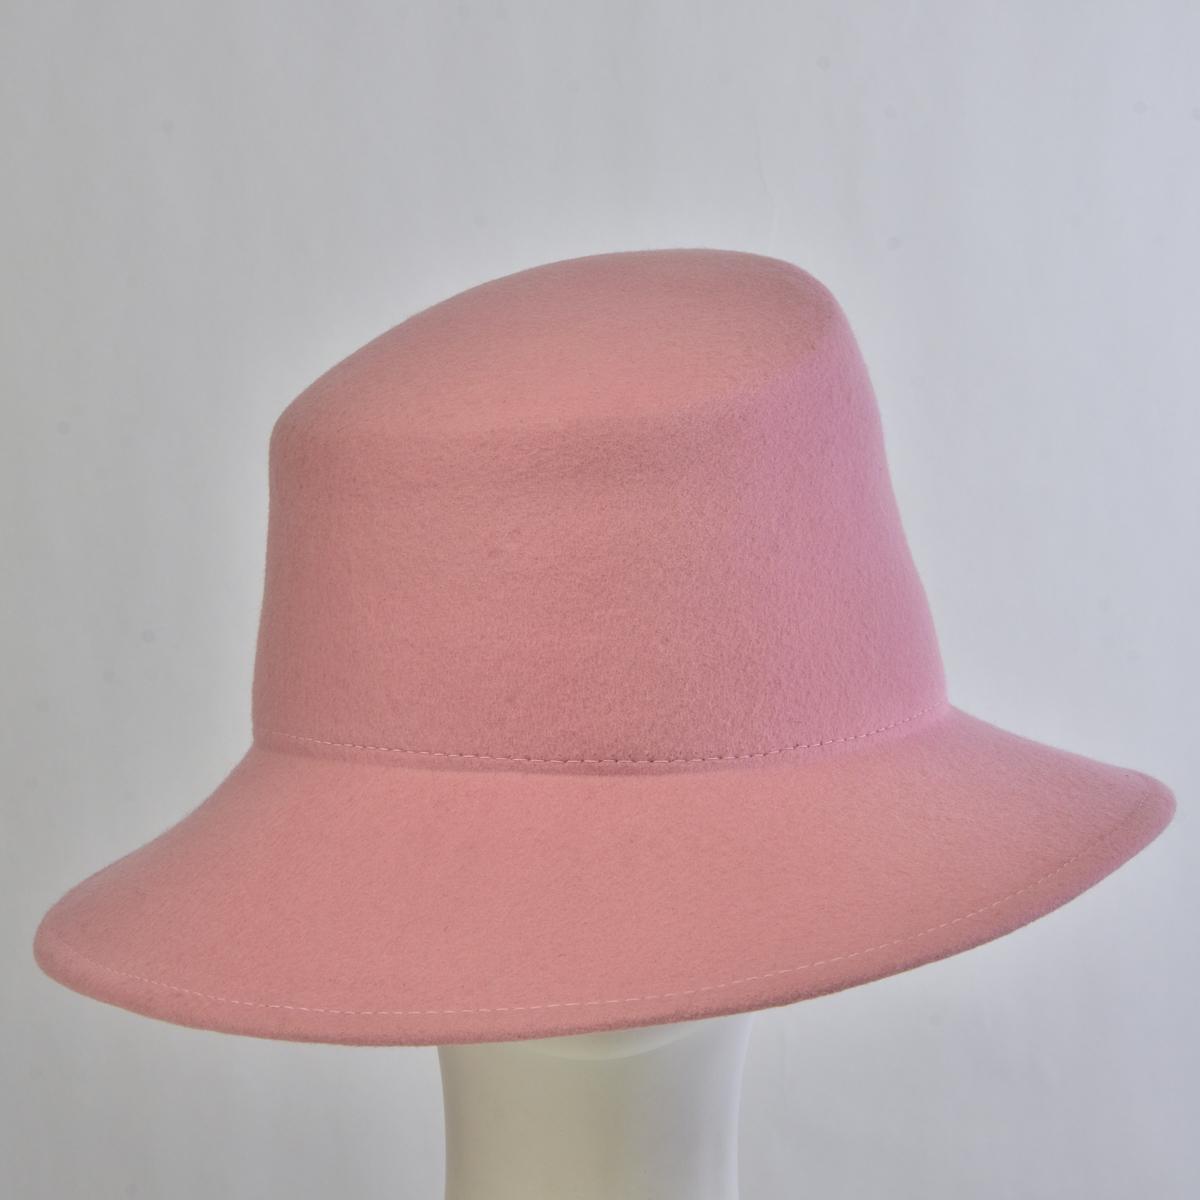 6ce97dc7bd2 Pink Slant Tall Crown Felt Plain Hats-W6007-PINK- Sun Yorkos